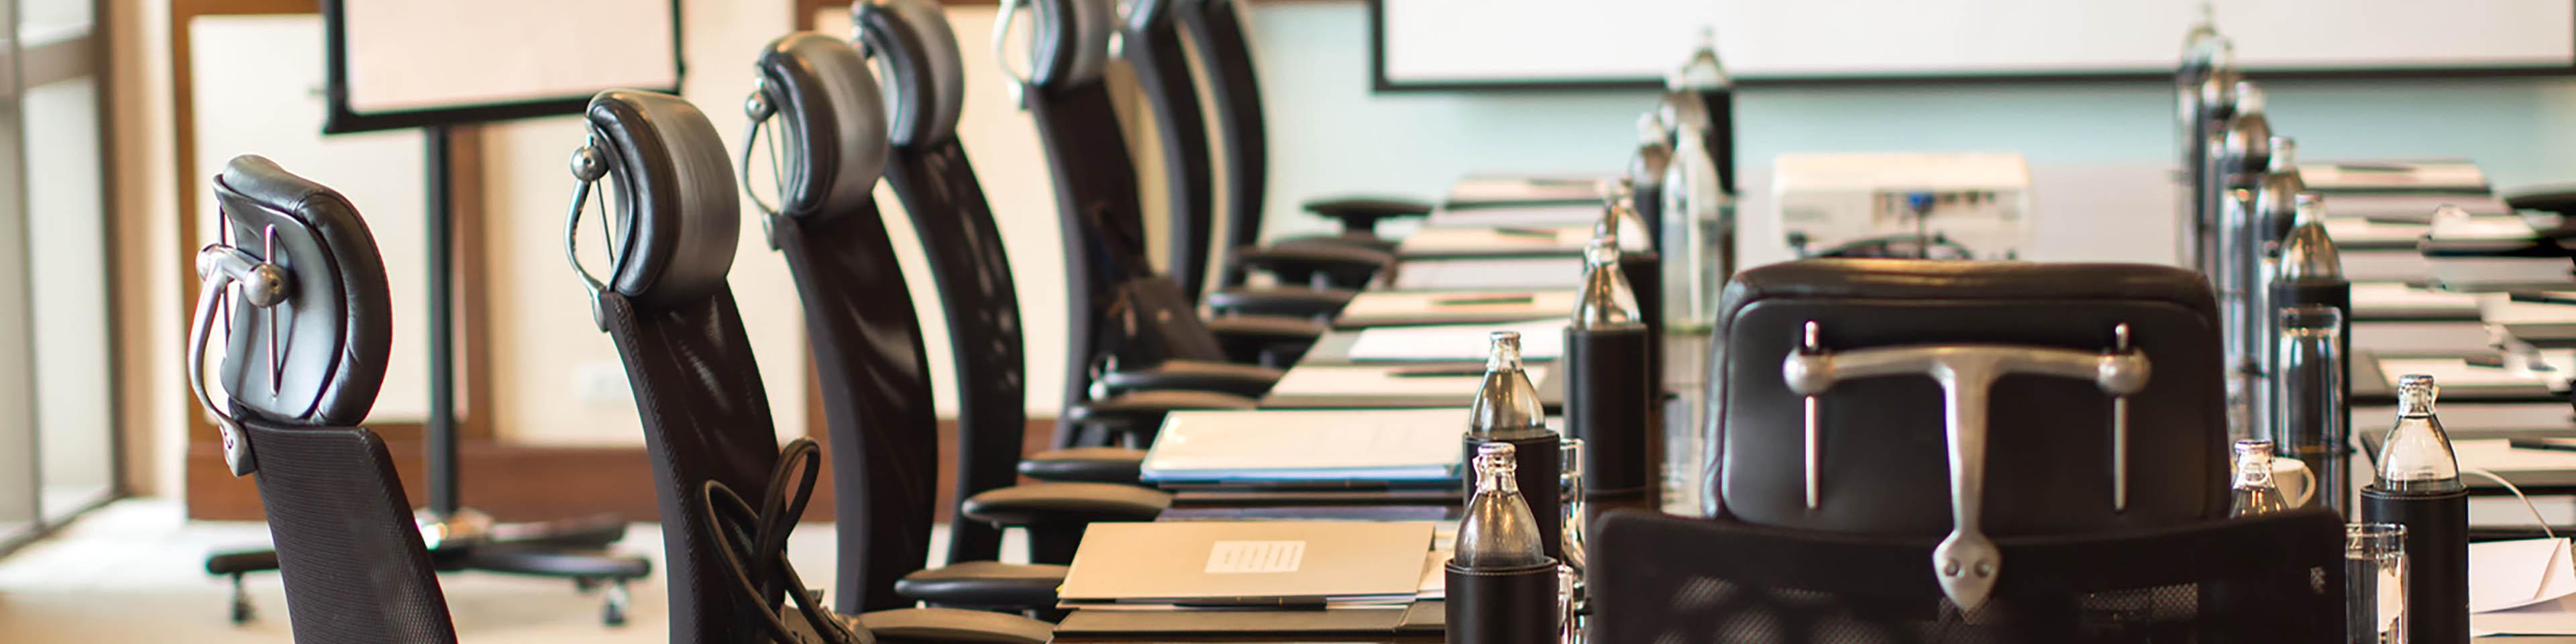 California: Gender Diversity for Boards of Directors